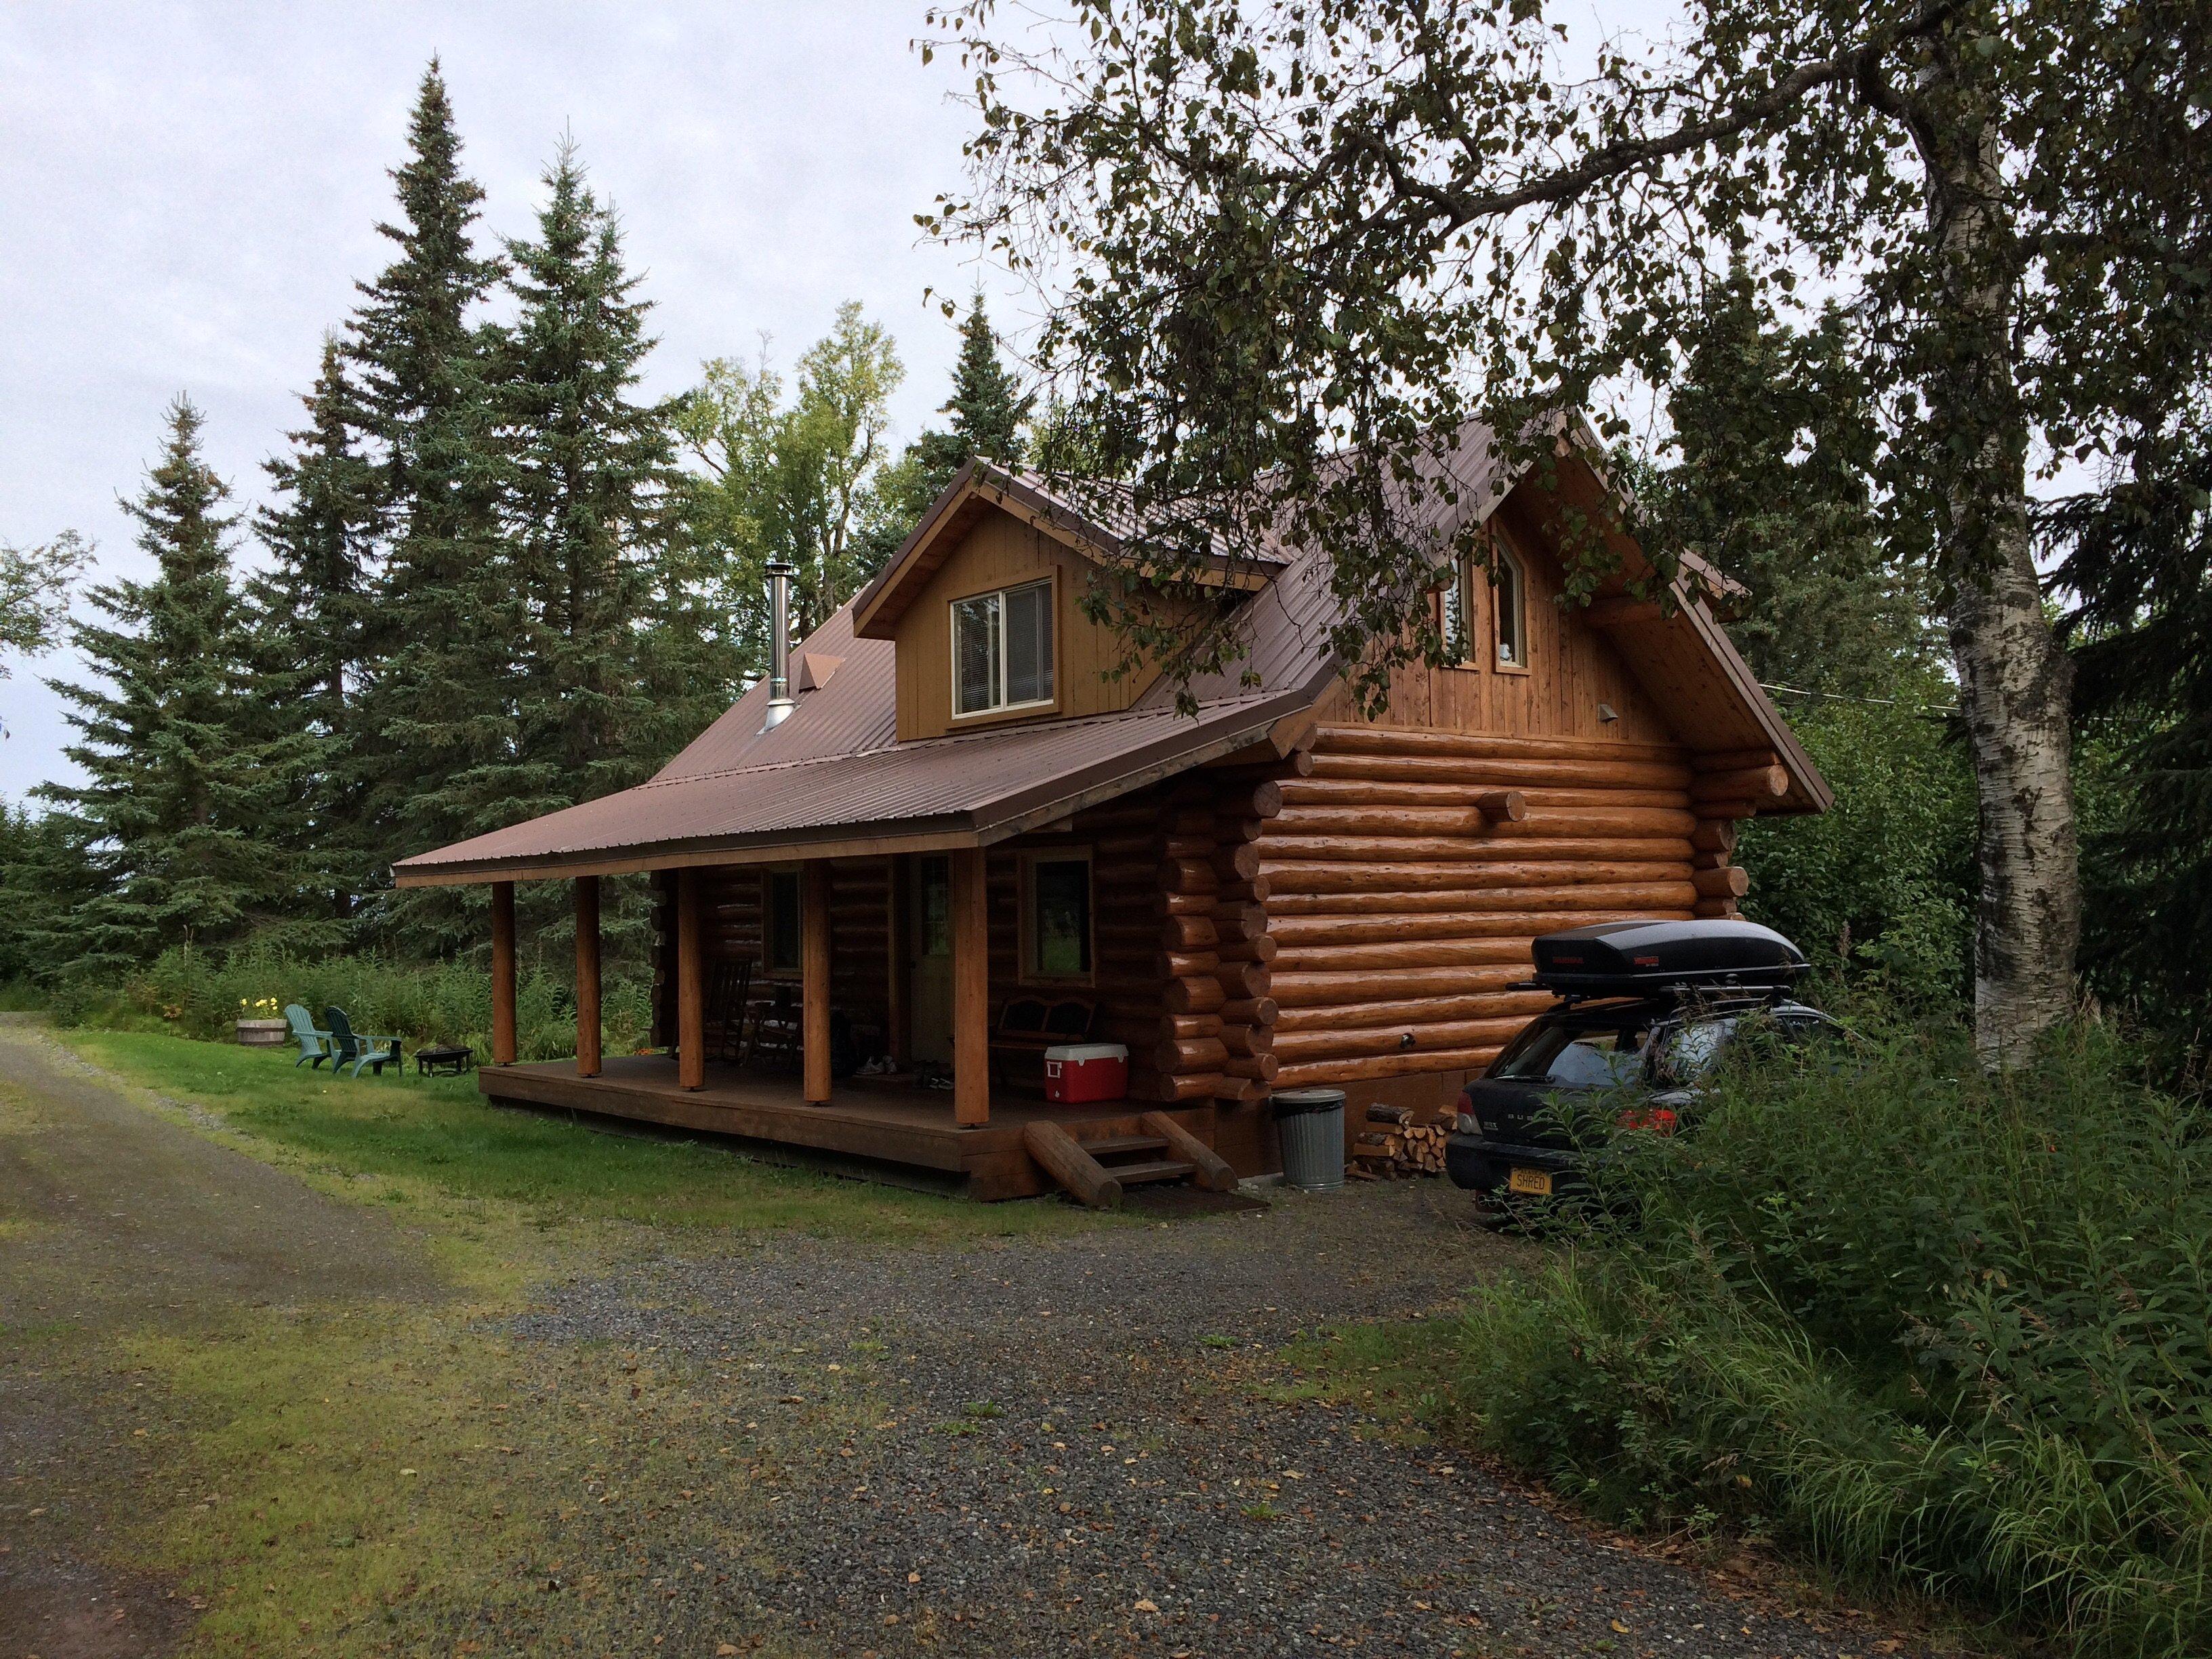 Tustumena Ridge Cabins